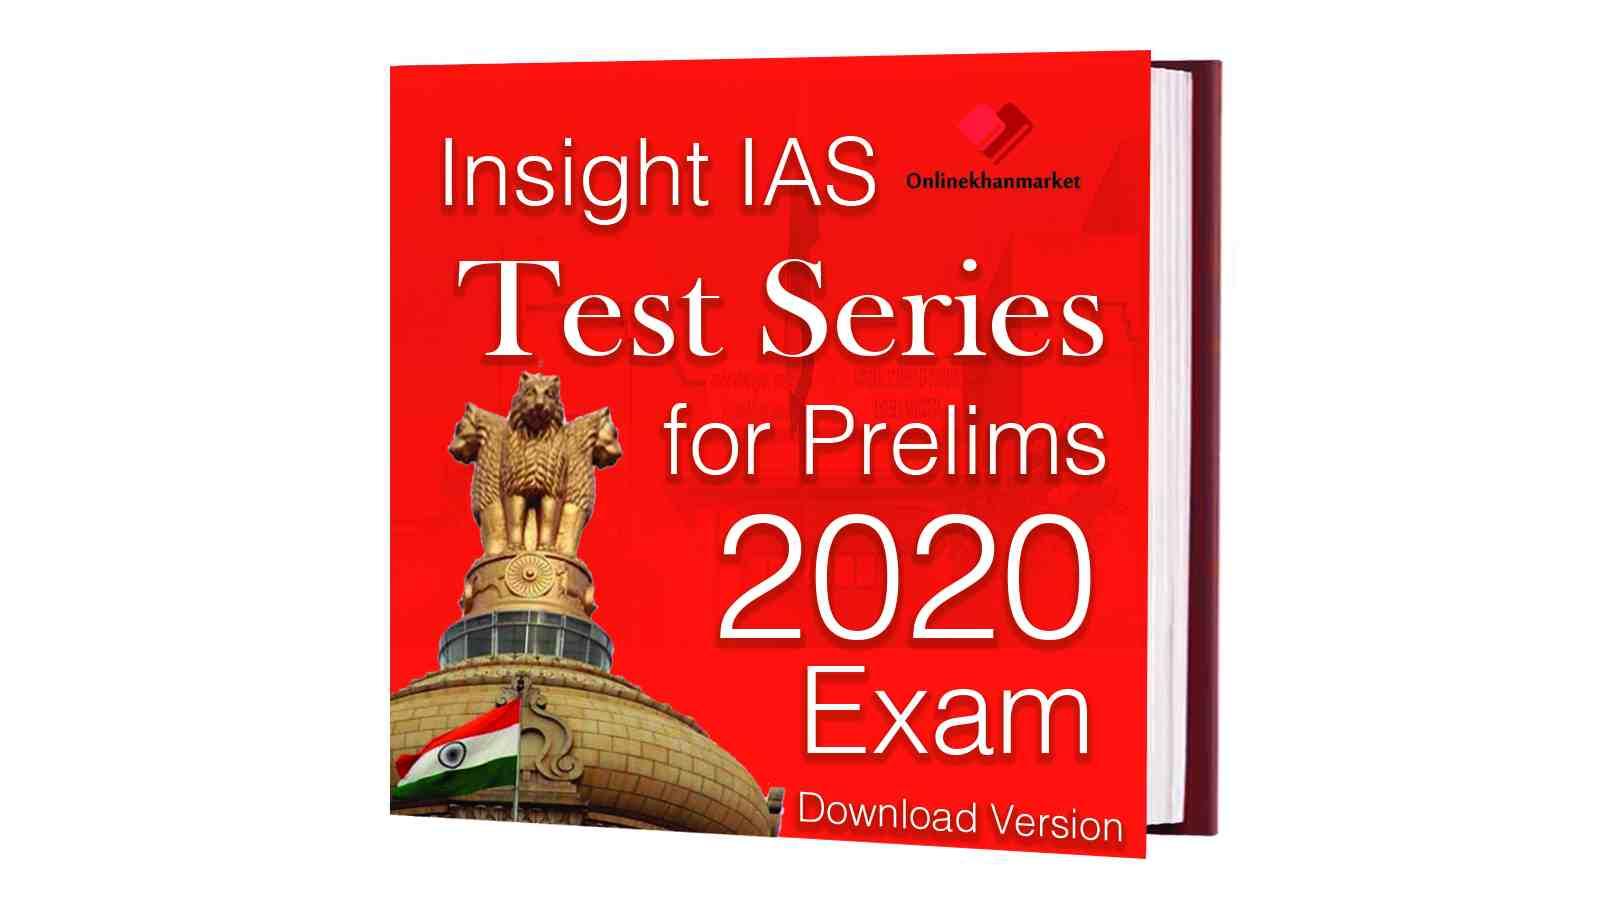 Insight IAS Prelims Test Series 2020